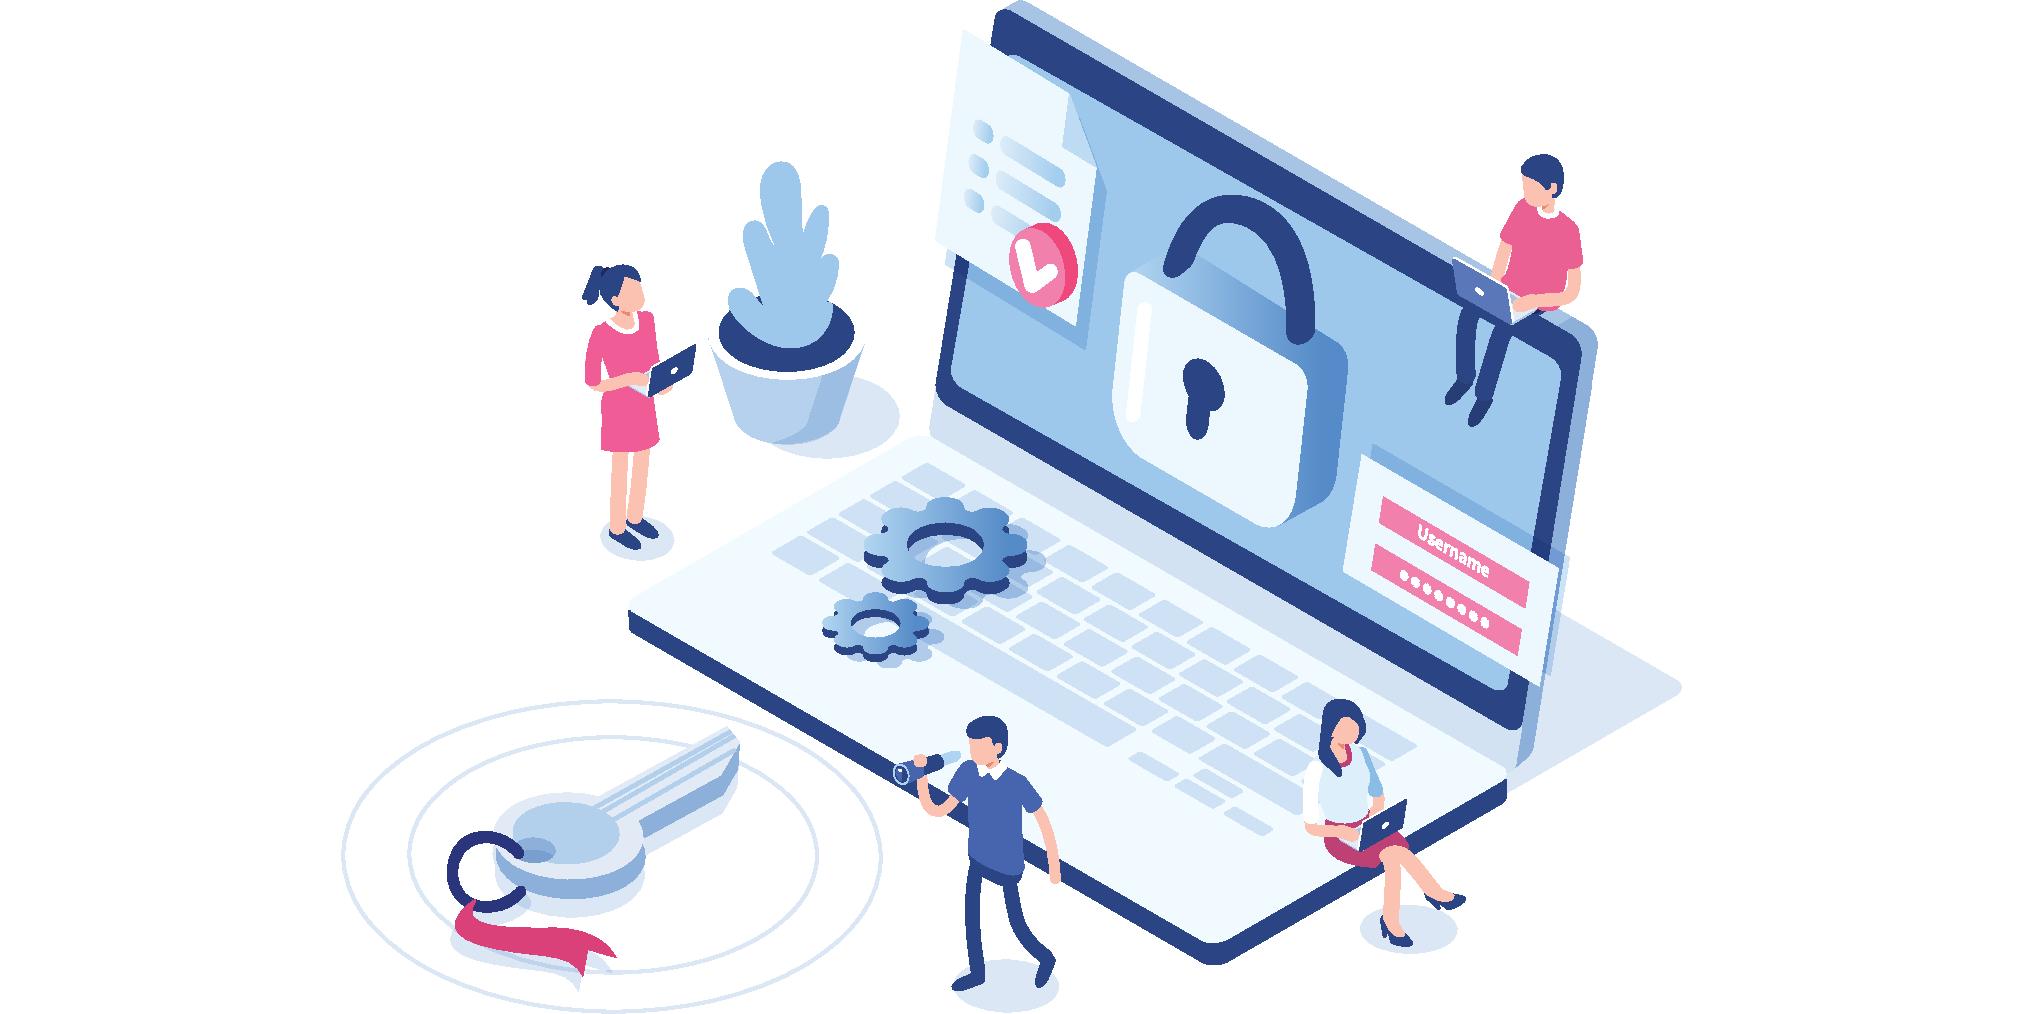 dam security illustration